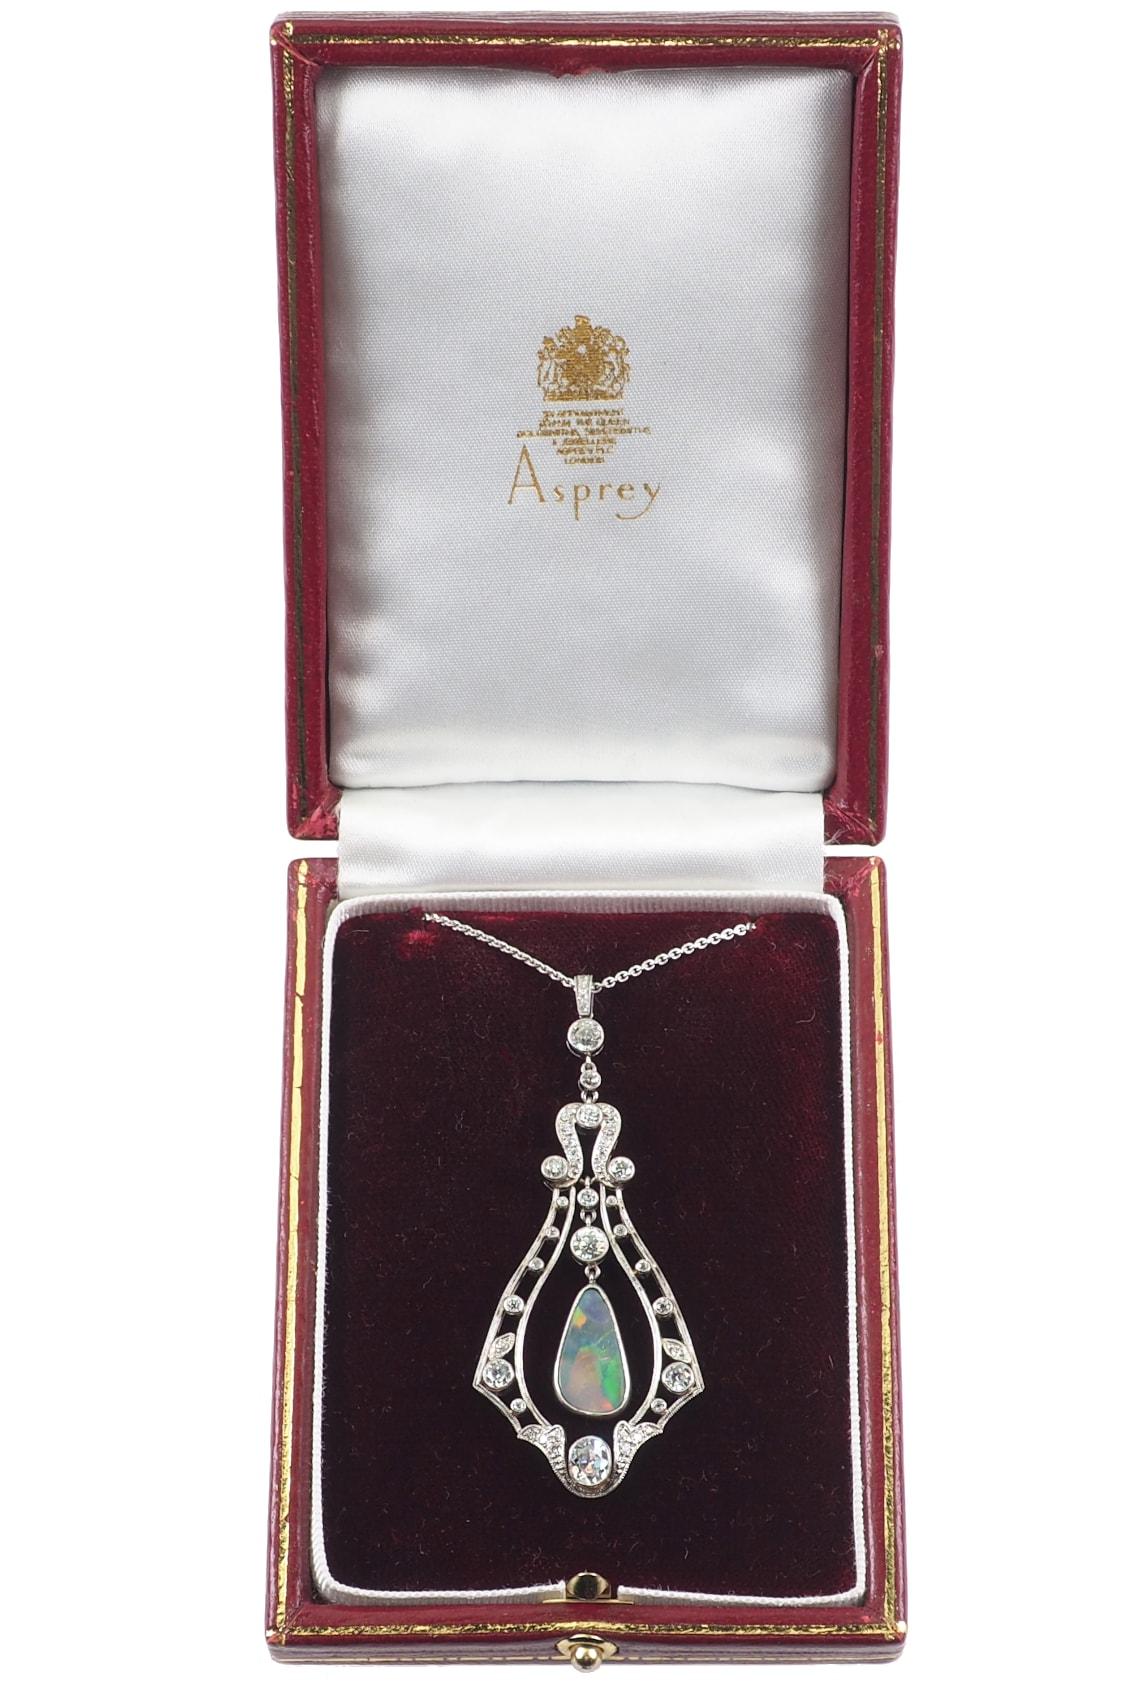 luxurious-antique-jewellery-2827